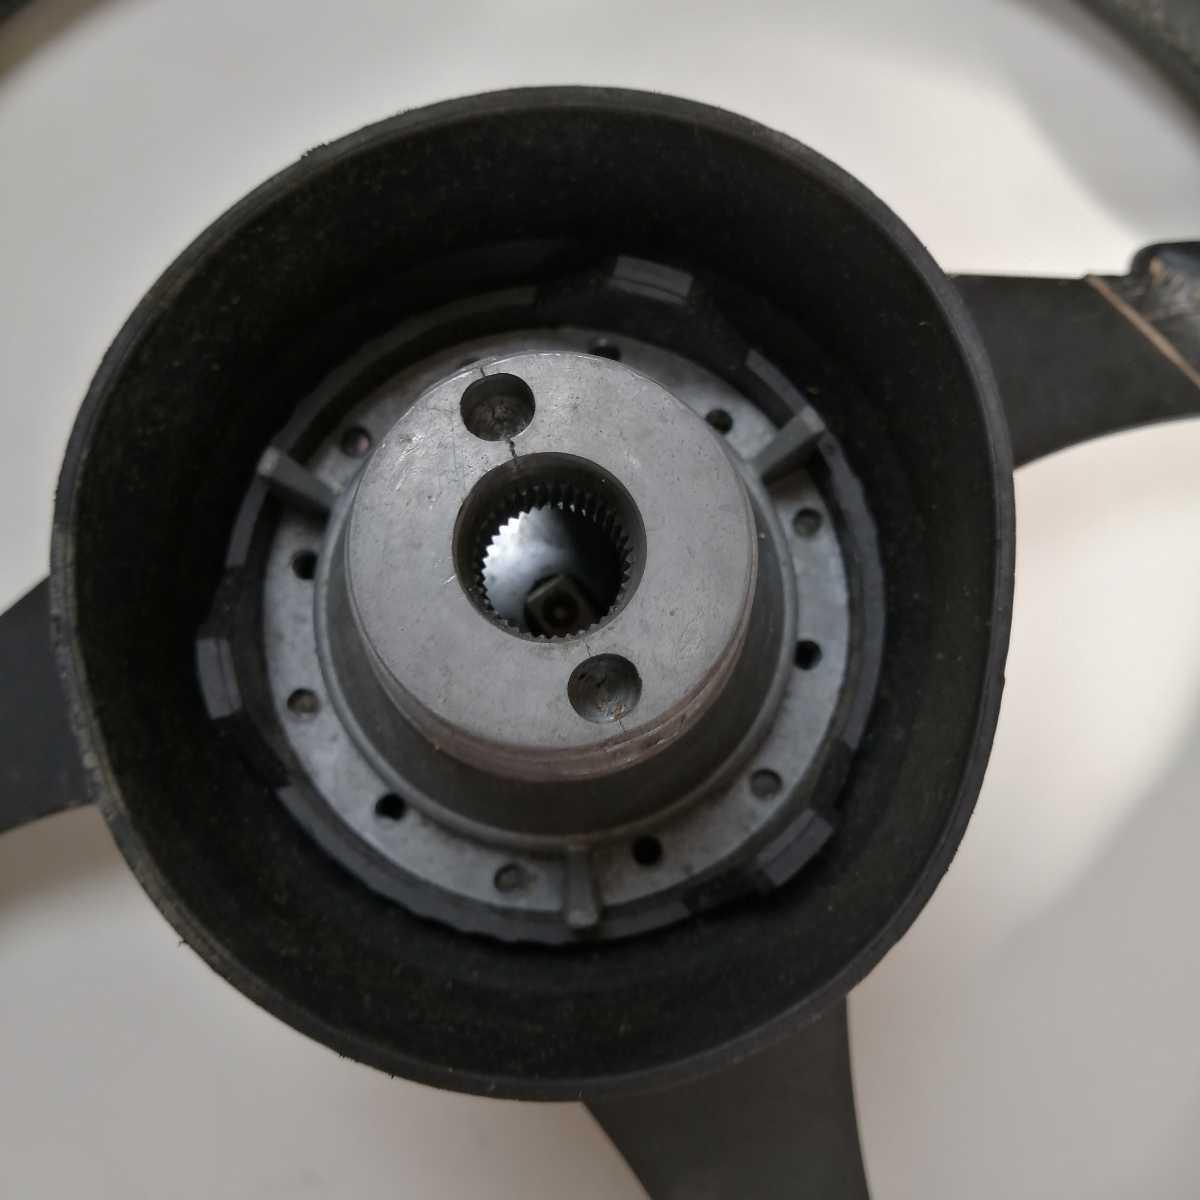 □21032211 NARDI/ナルディ ステアリング ホーンボタン ステアリング セット 黒/黒 直径約36.5cm ハンドル USED_画像8